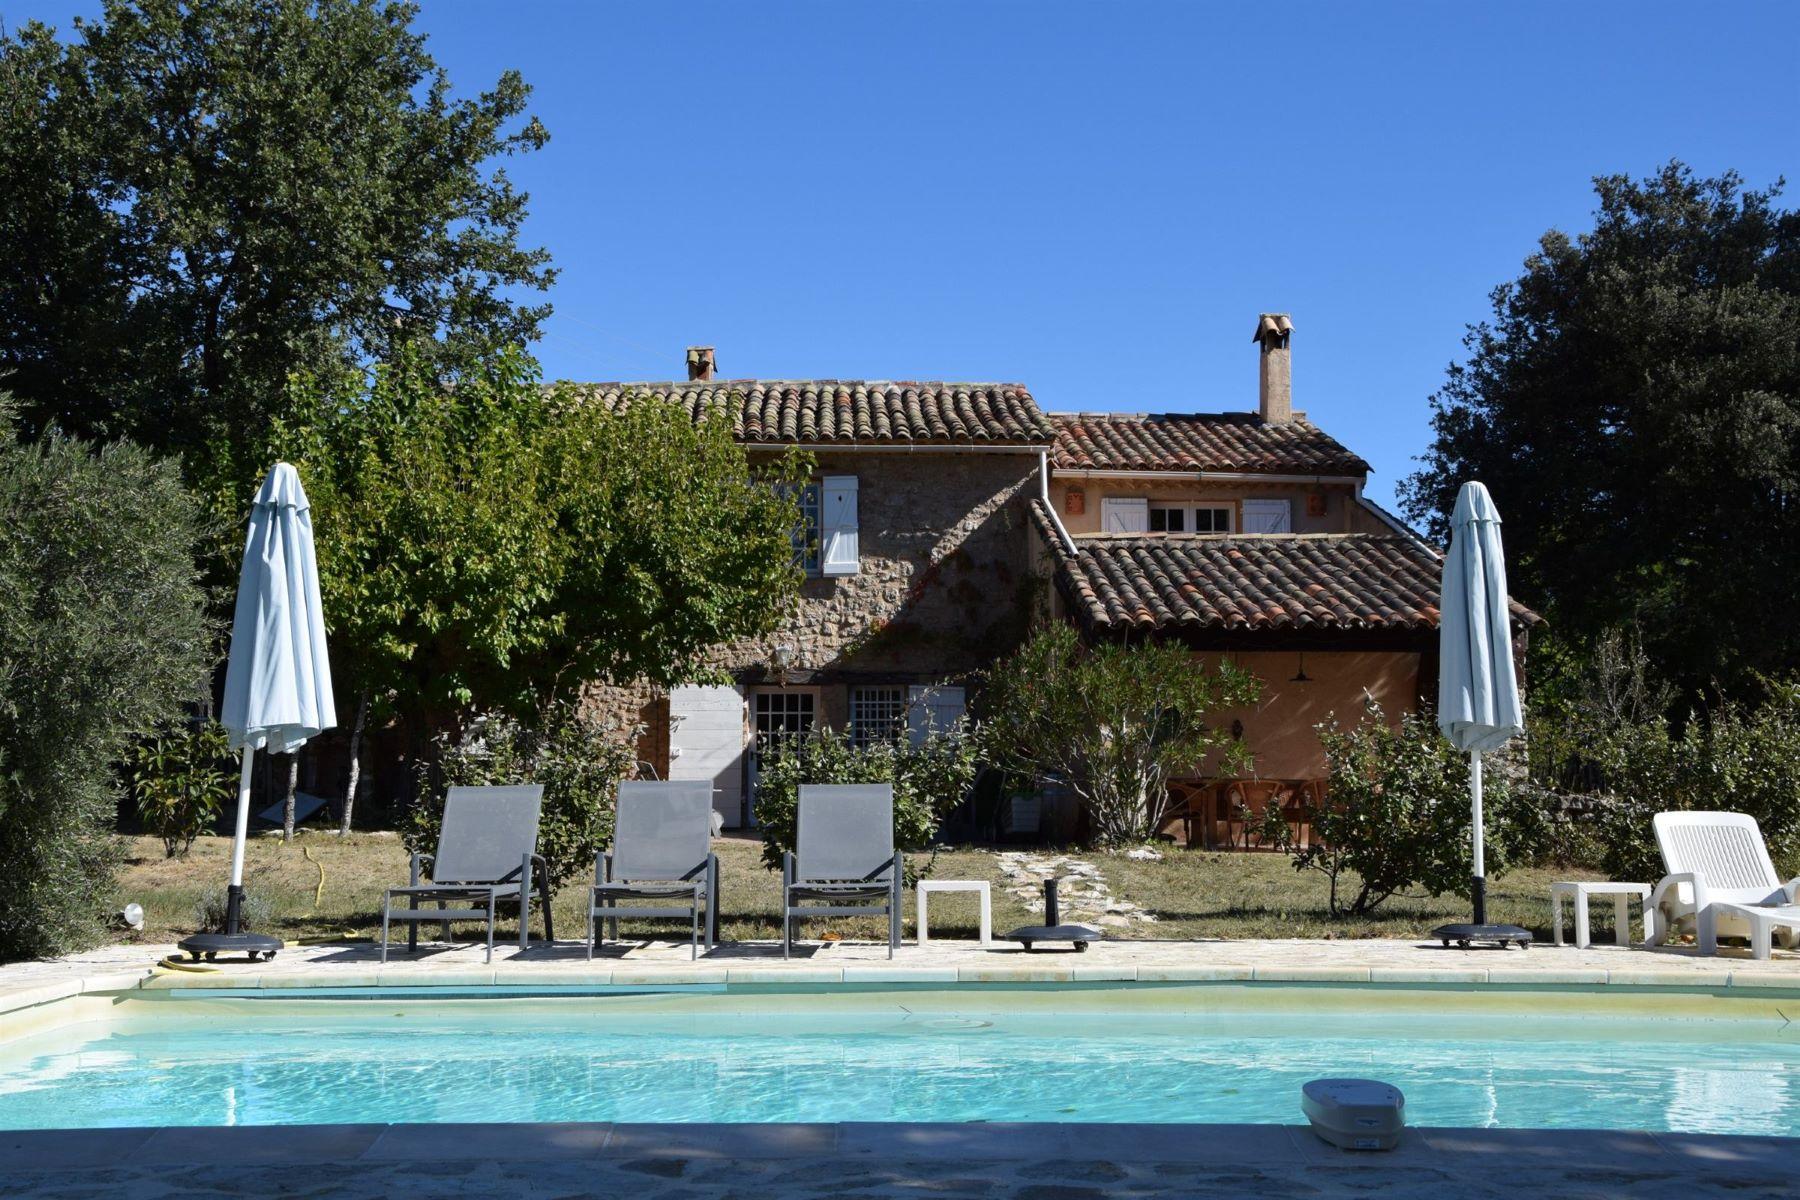 Single Family Homes por un Venta en Exclusive: Authentic Mas from the 18th century Fox Amphoux, Provincia - Alpes - Costa Azul 83670 Francia